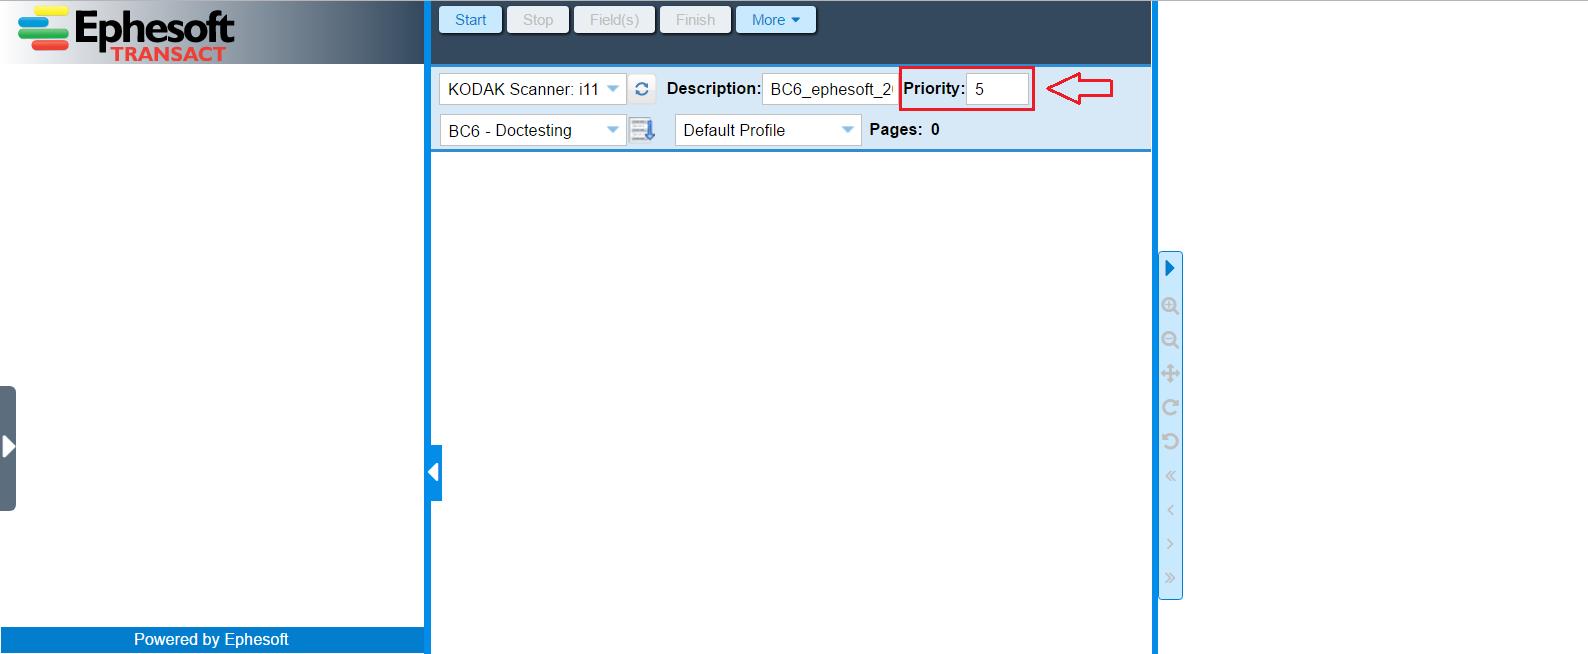 C:UsersEphesoftAppDataLocalMicrosoftWindowsINetCacheContent.Wordwebscan1.png